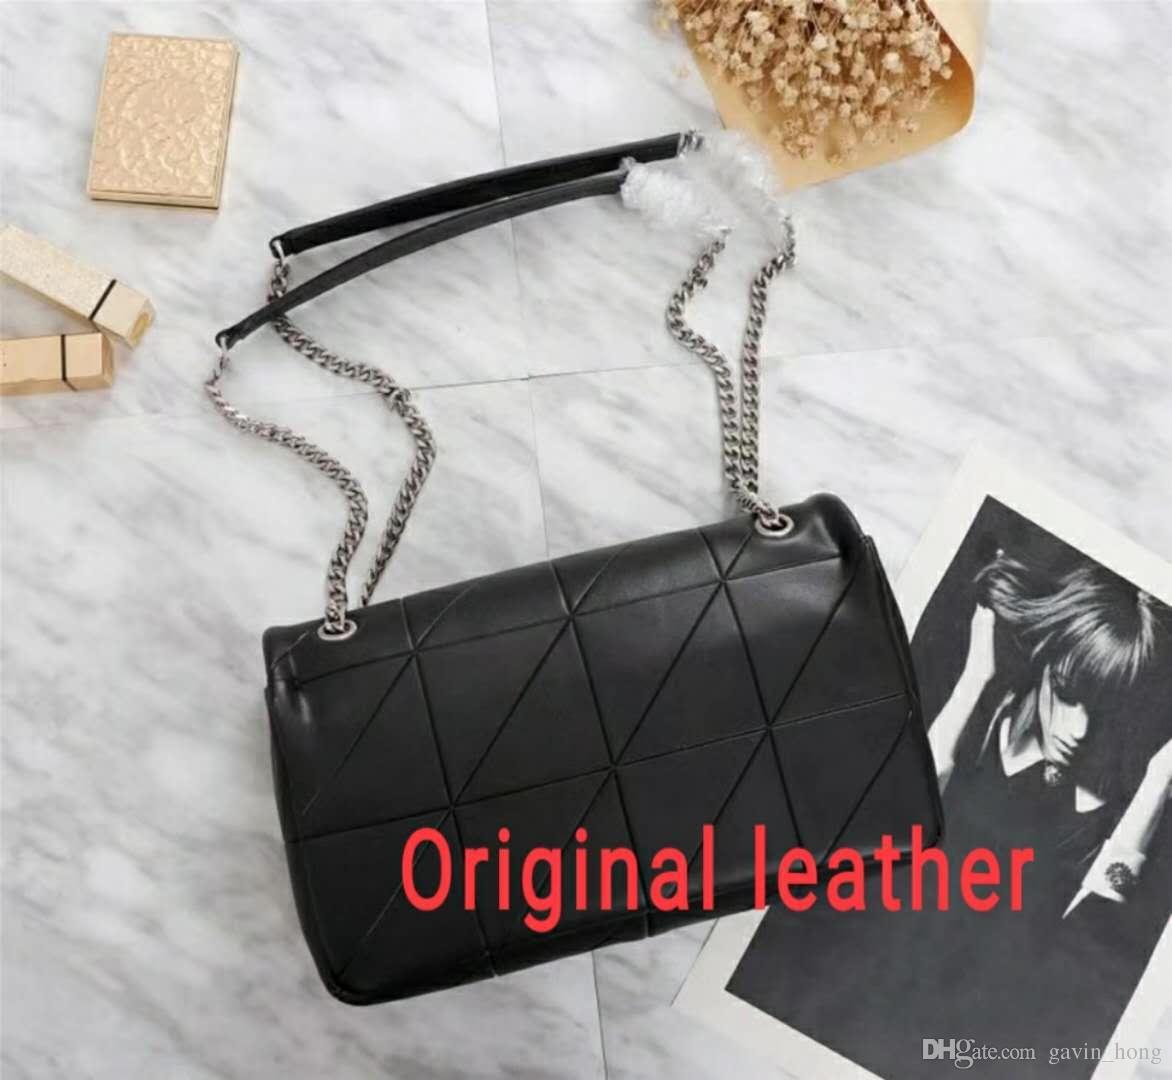 94f1aafb0dce ! New Style Classic Fashion Designer Bags Women Handbag Bag Shoulder Bags  Lady Small Chains Totes Handbags Bags 26826 Cheap Bags Cute Purses From  Gavin hong ...